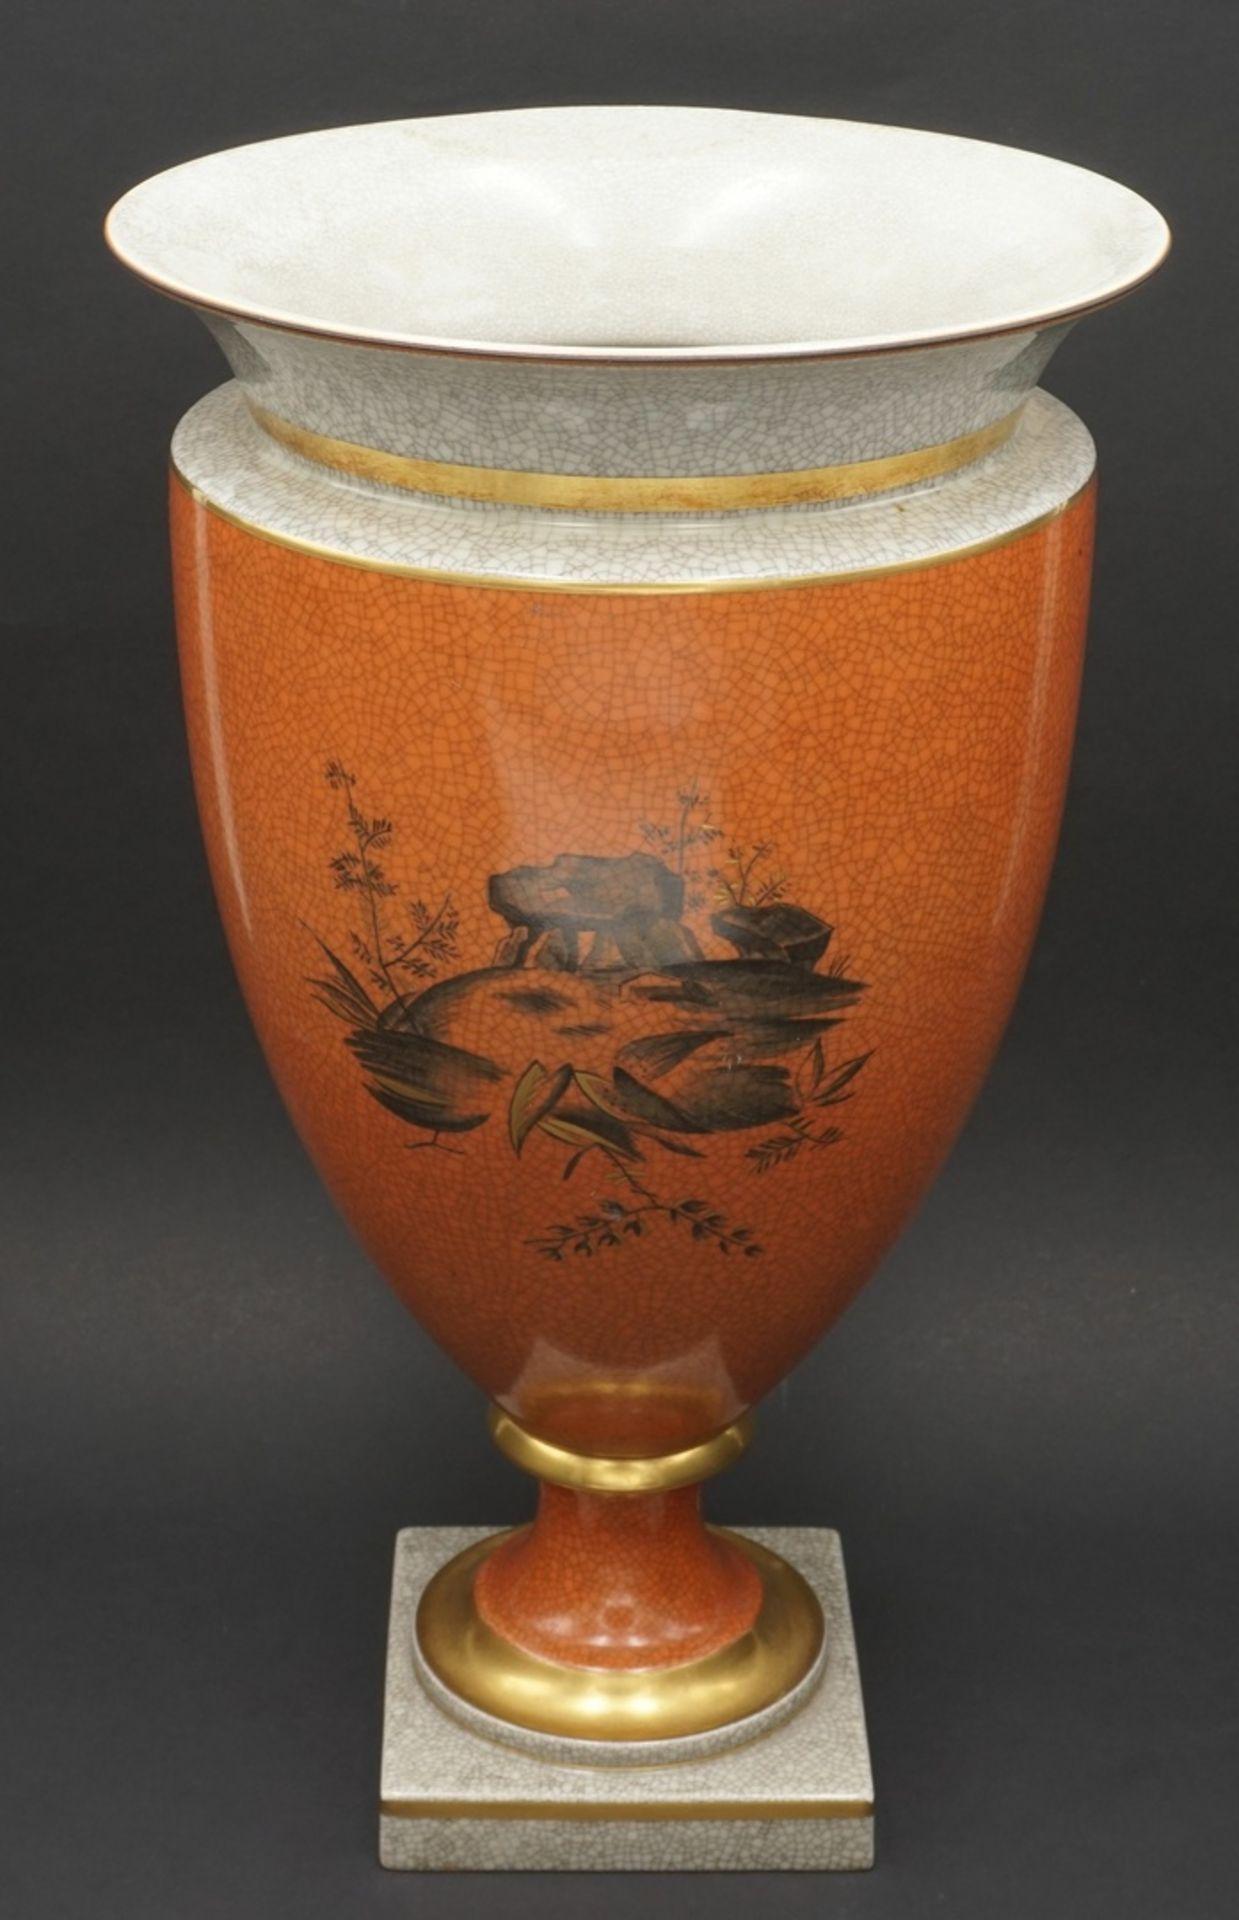 Royal Copenhagen große Krakelee Vase mit Schale, um 1950 - Bild 3 aus 8